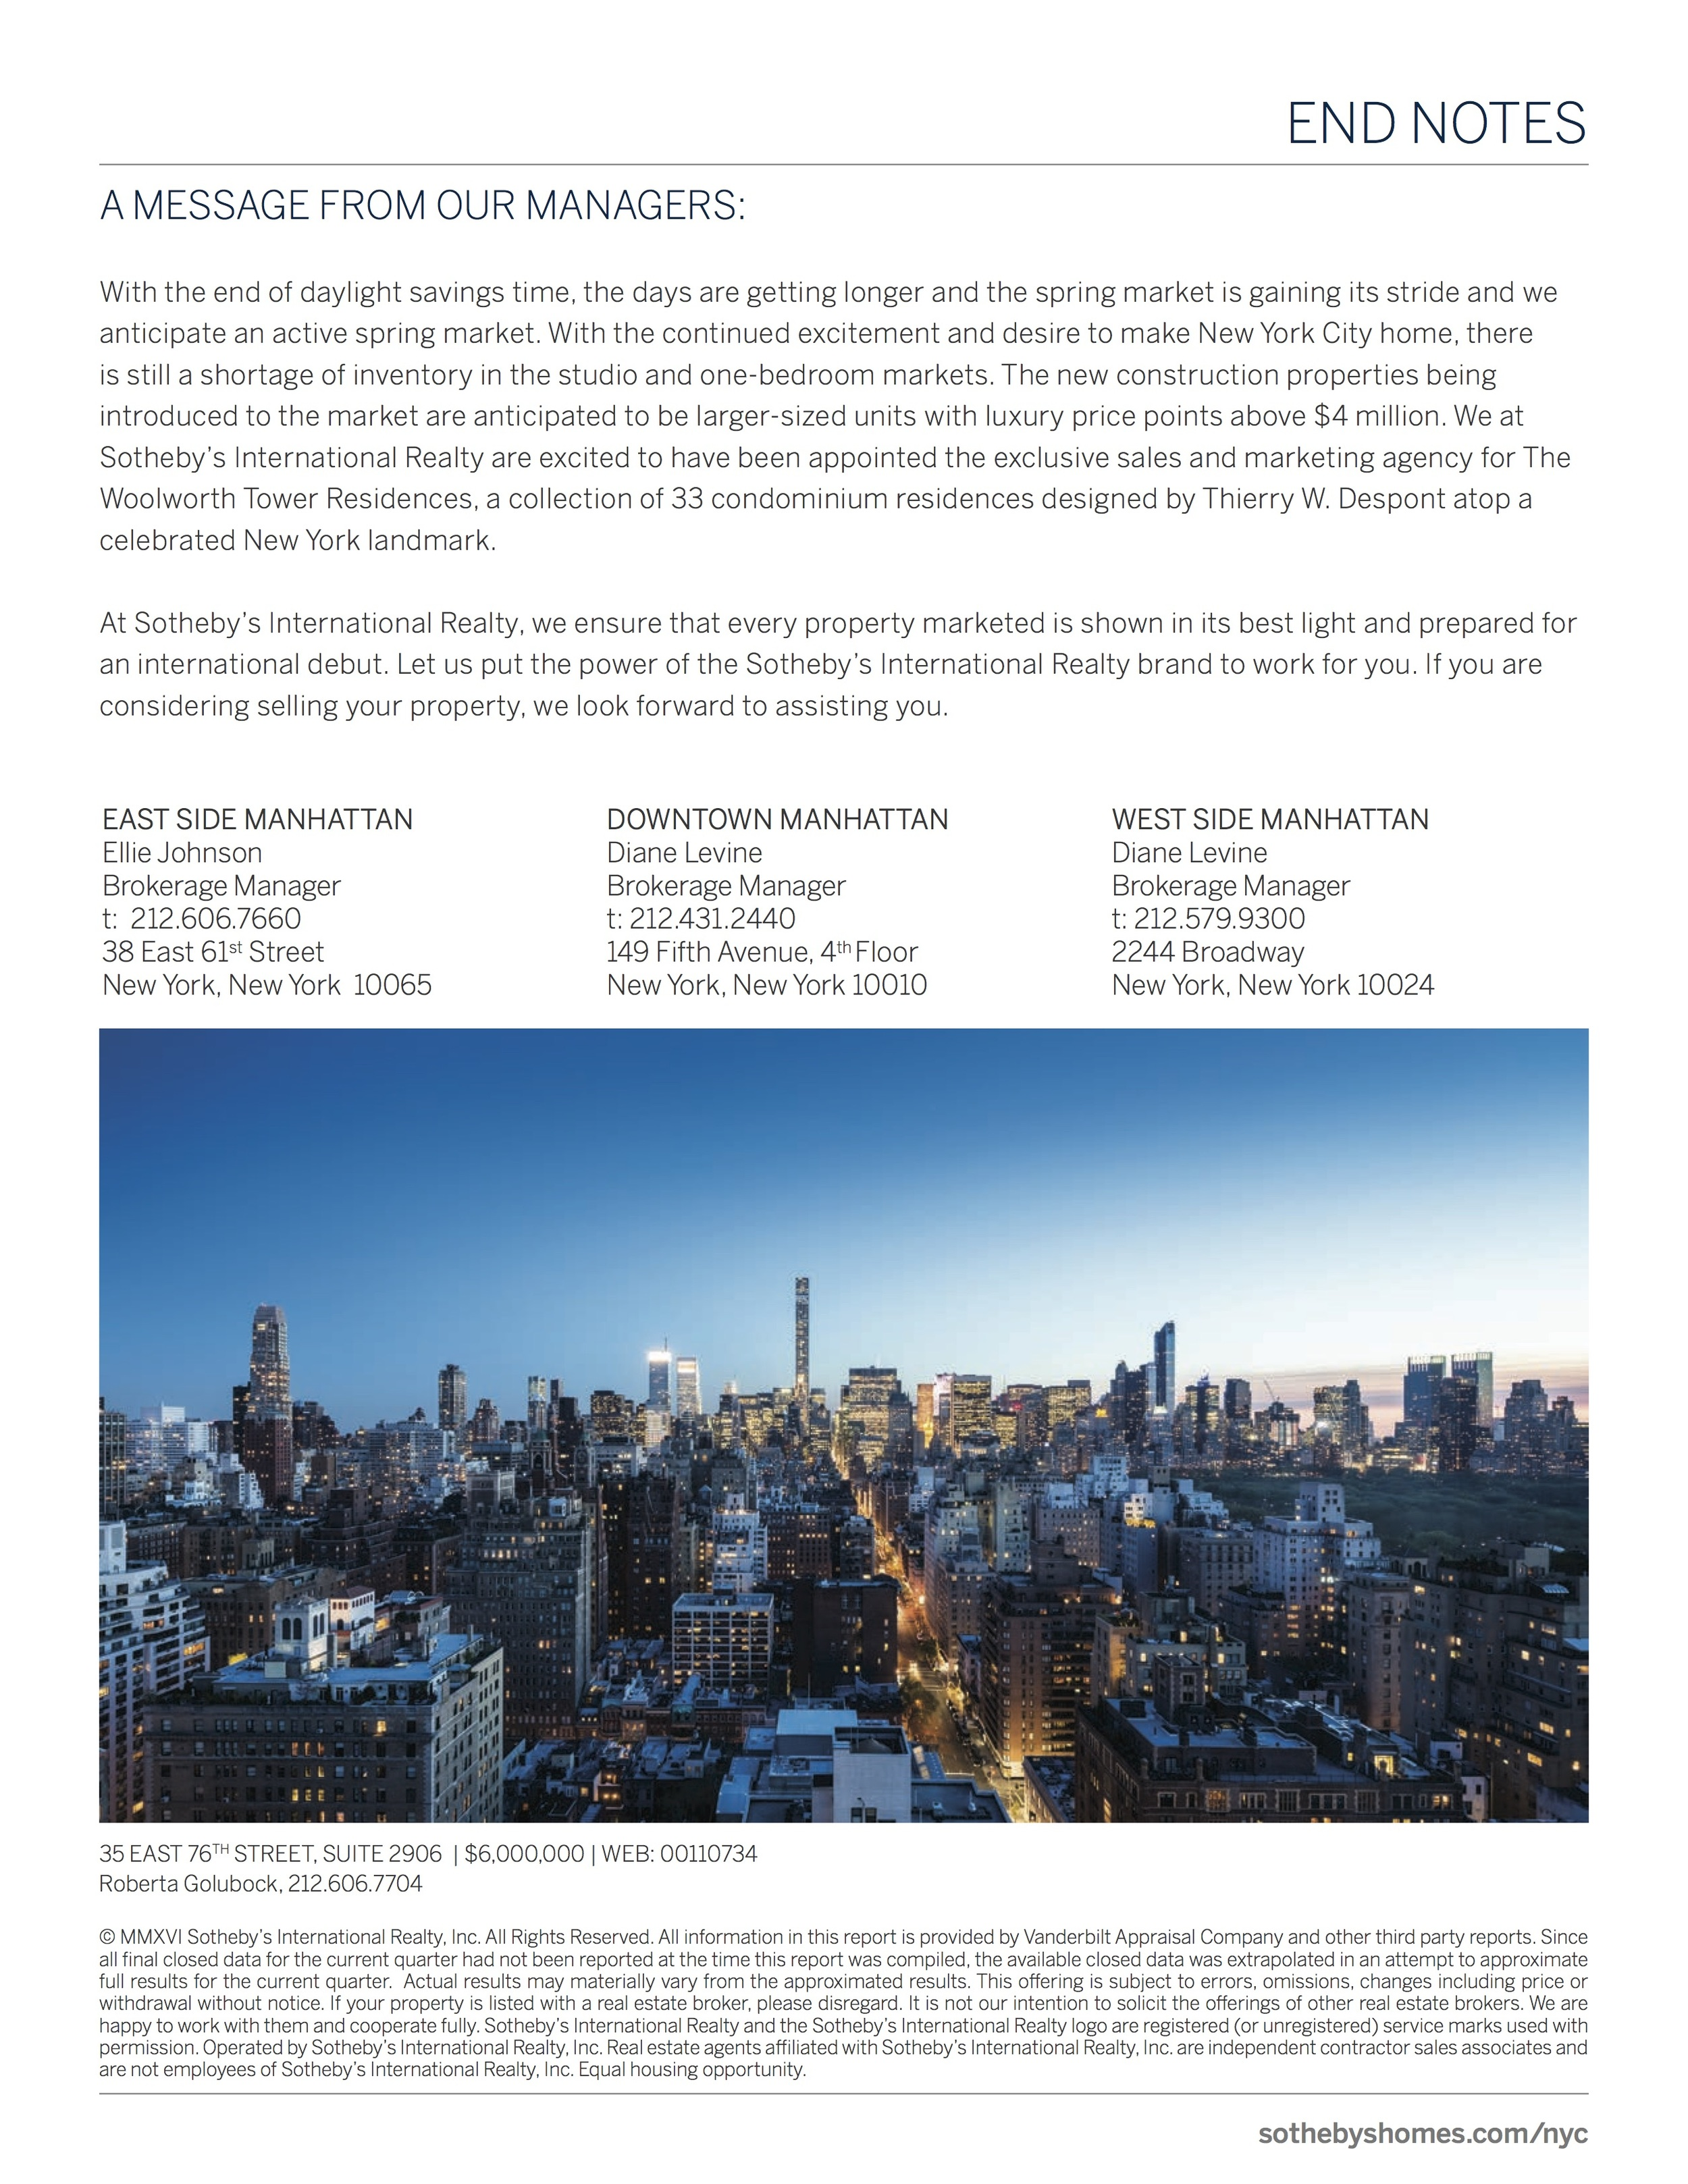 SothebysInternationalRealty_Manhattan_MarketReport_2016_Q1_10.jpg